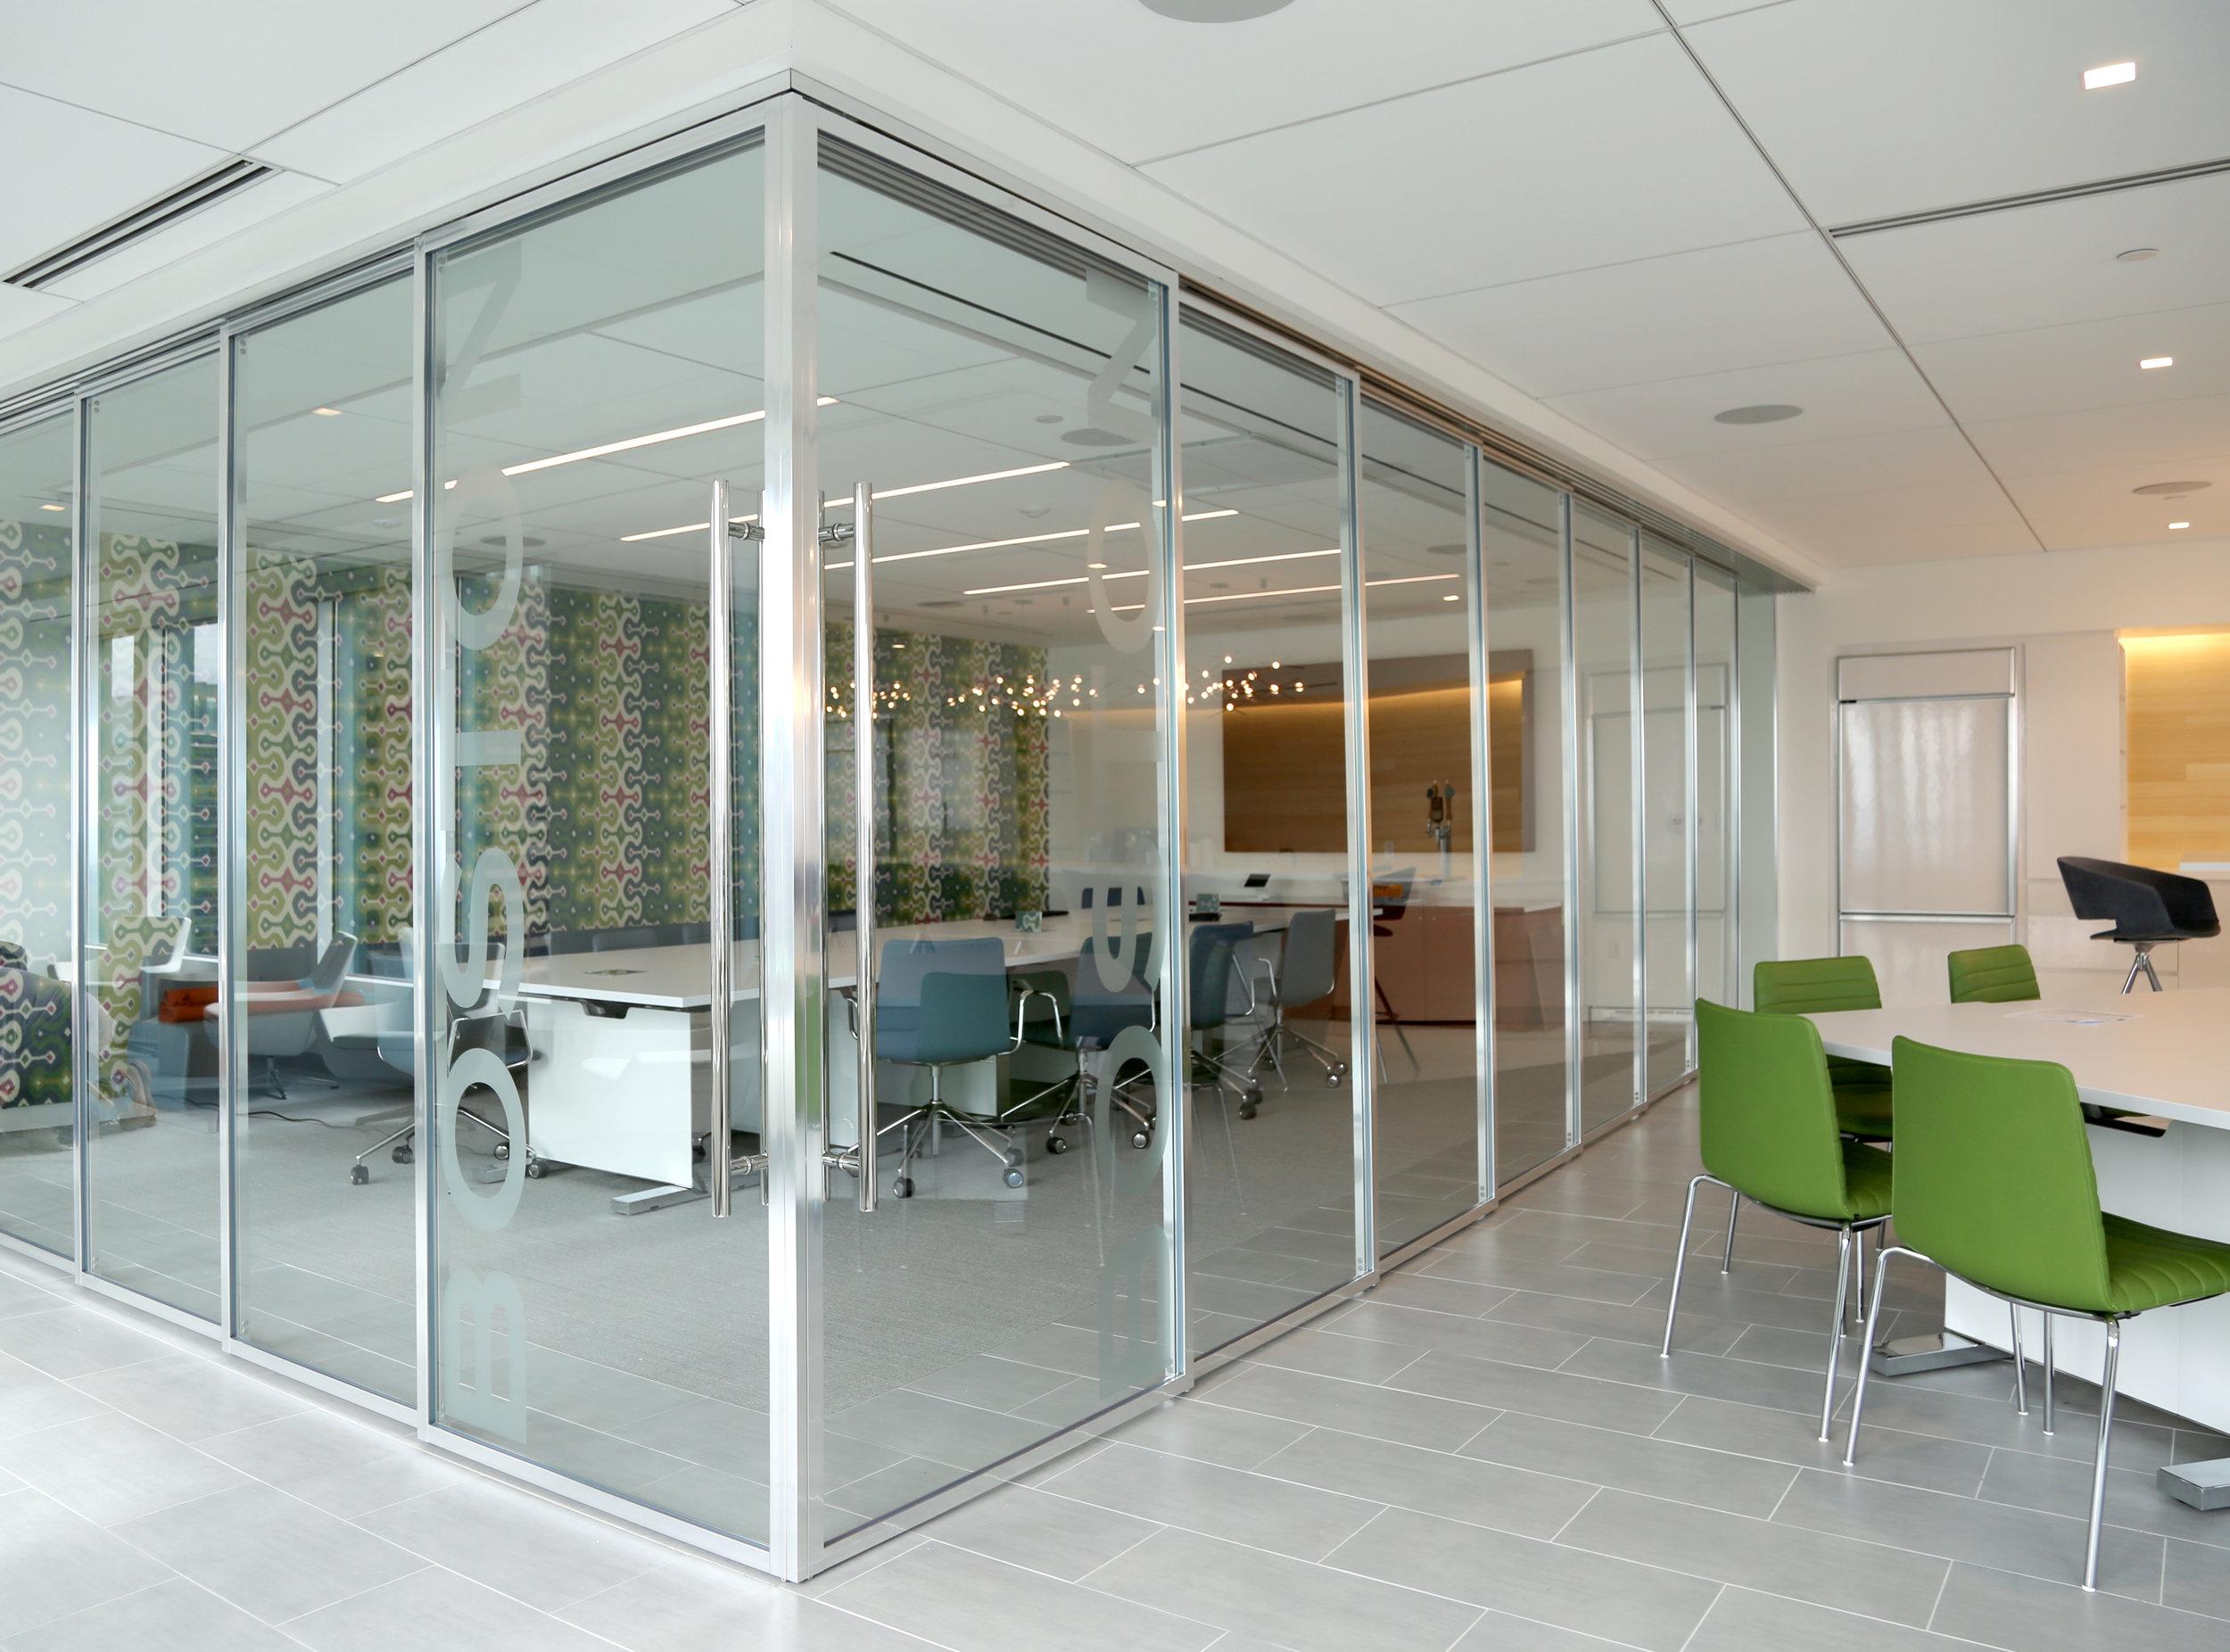 Telescoping Walls Aluminum Framed Glass Panel Sliding Stacking System - Spaceworks AI.jpg